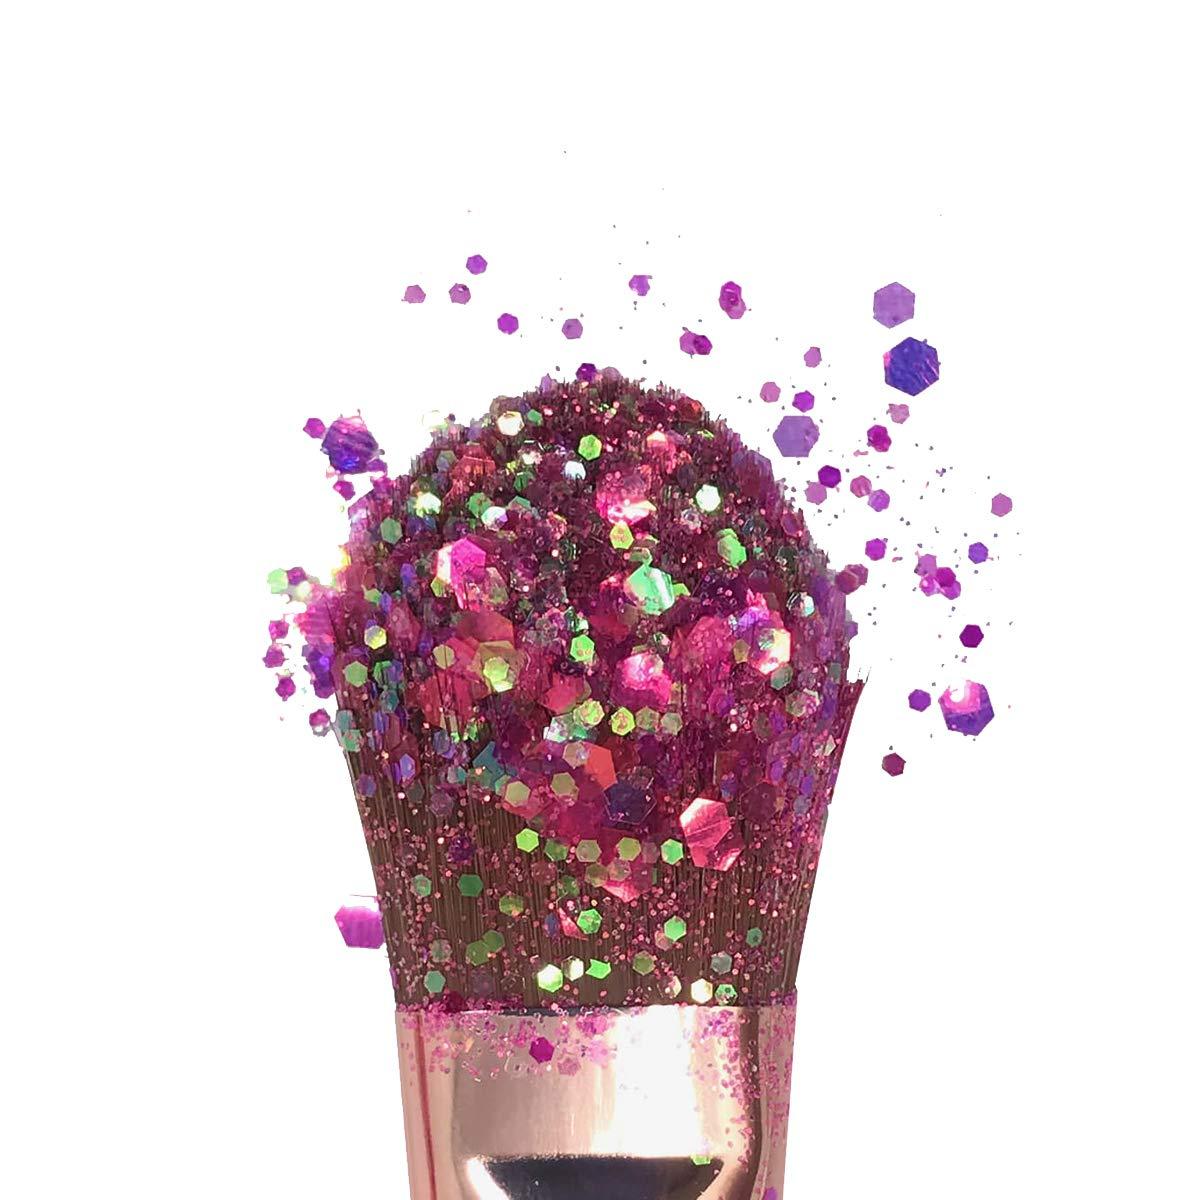 Hemway Hot Pink Iridescent Mix Glitter Chunky Multi Purpose Dust Powder Arts & Crafts Wine Glass Decoration Weddings Flowers Cosmetic Face Eye Body Nails Skin Hair Festival 100g by Hemway (Image #5)